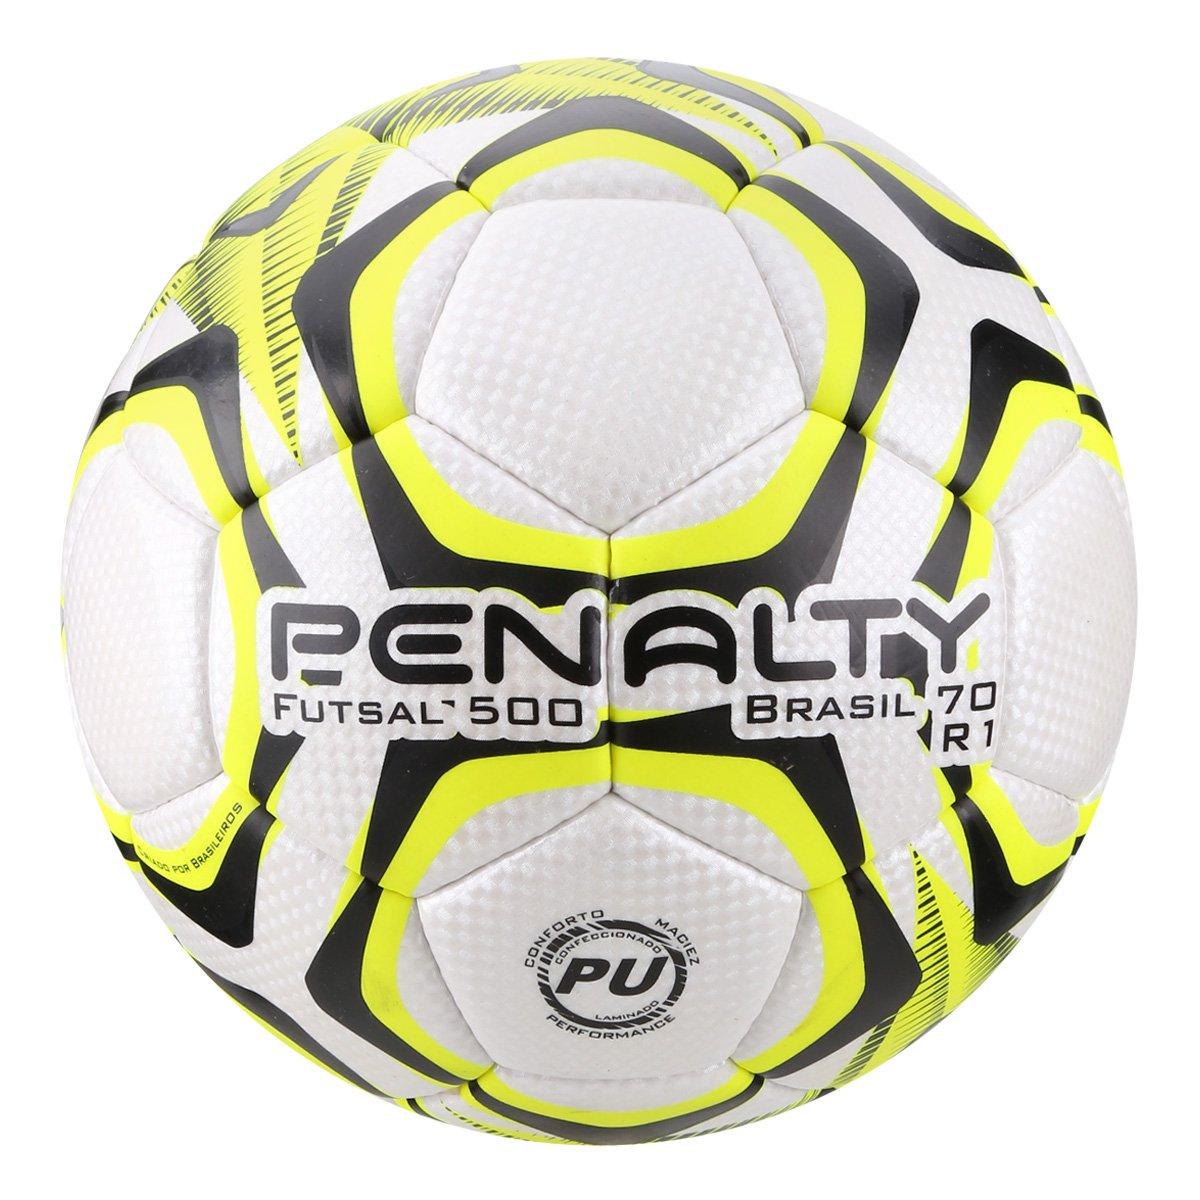 1b819a652a Bola Futsal Penalty Brasil 70 500 R1 IX